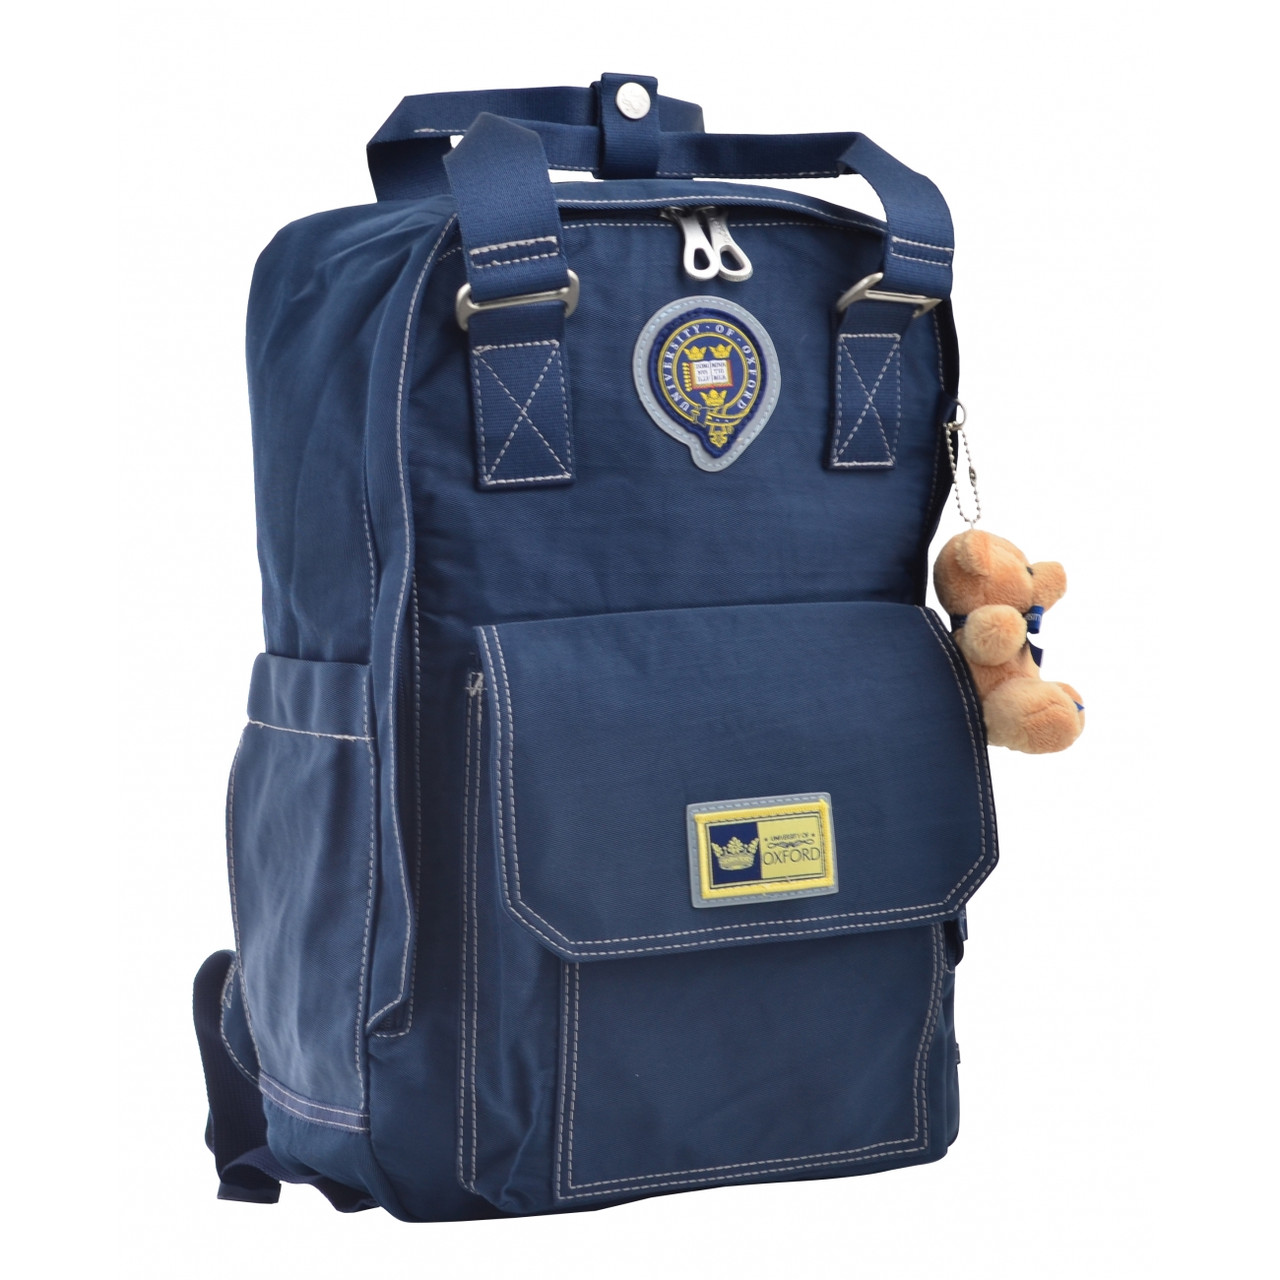 Рюкзак молодежный OX 403, 47*30.5*16.5, темно-синий